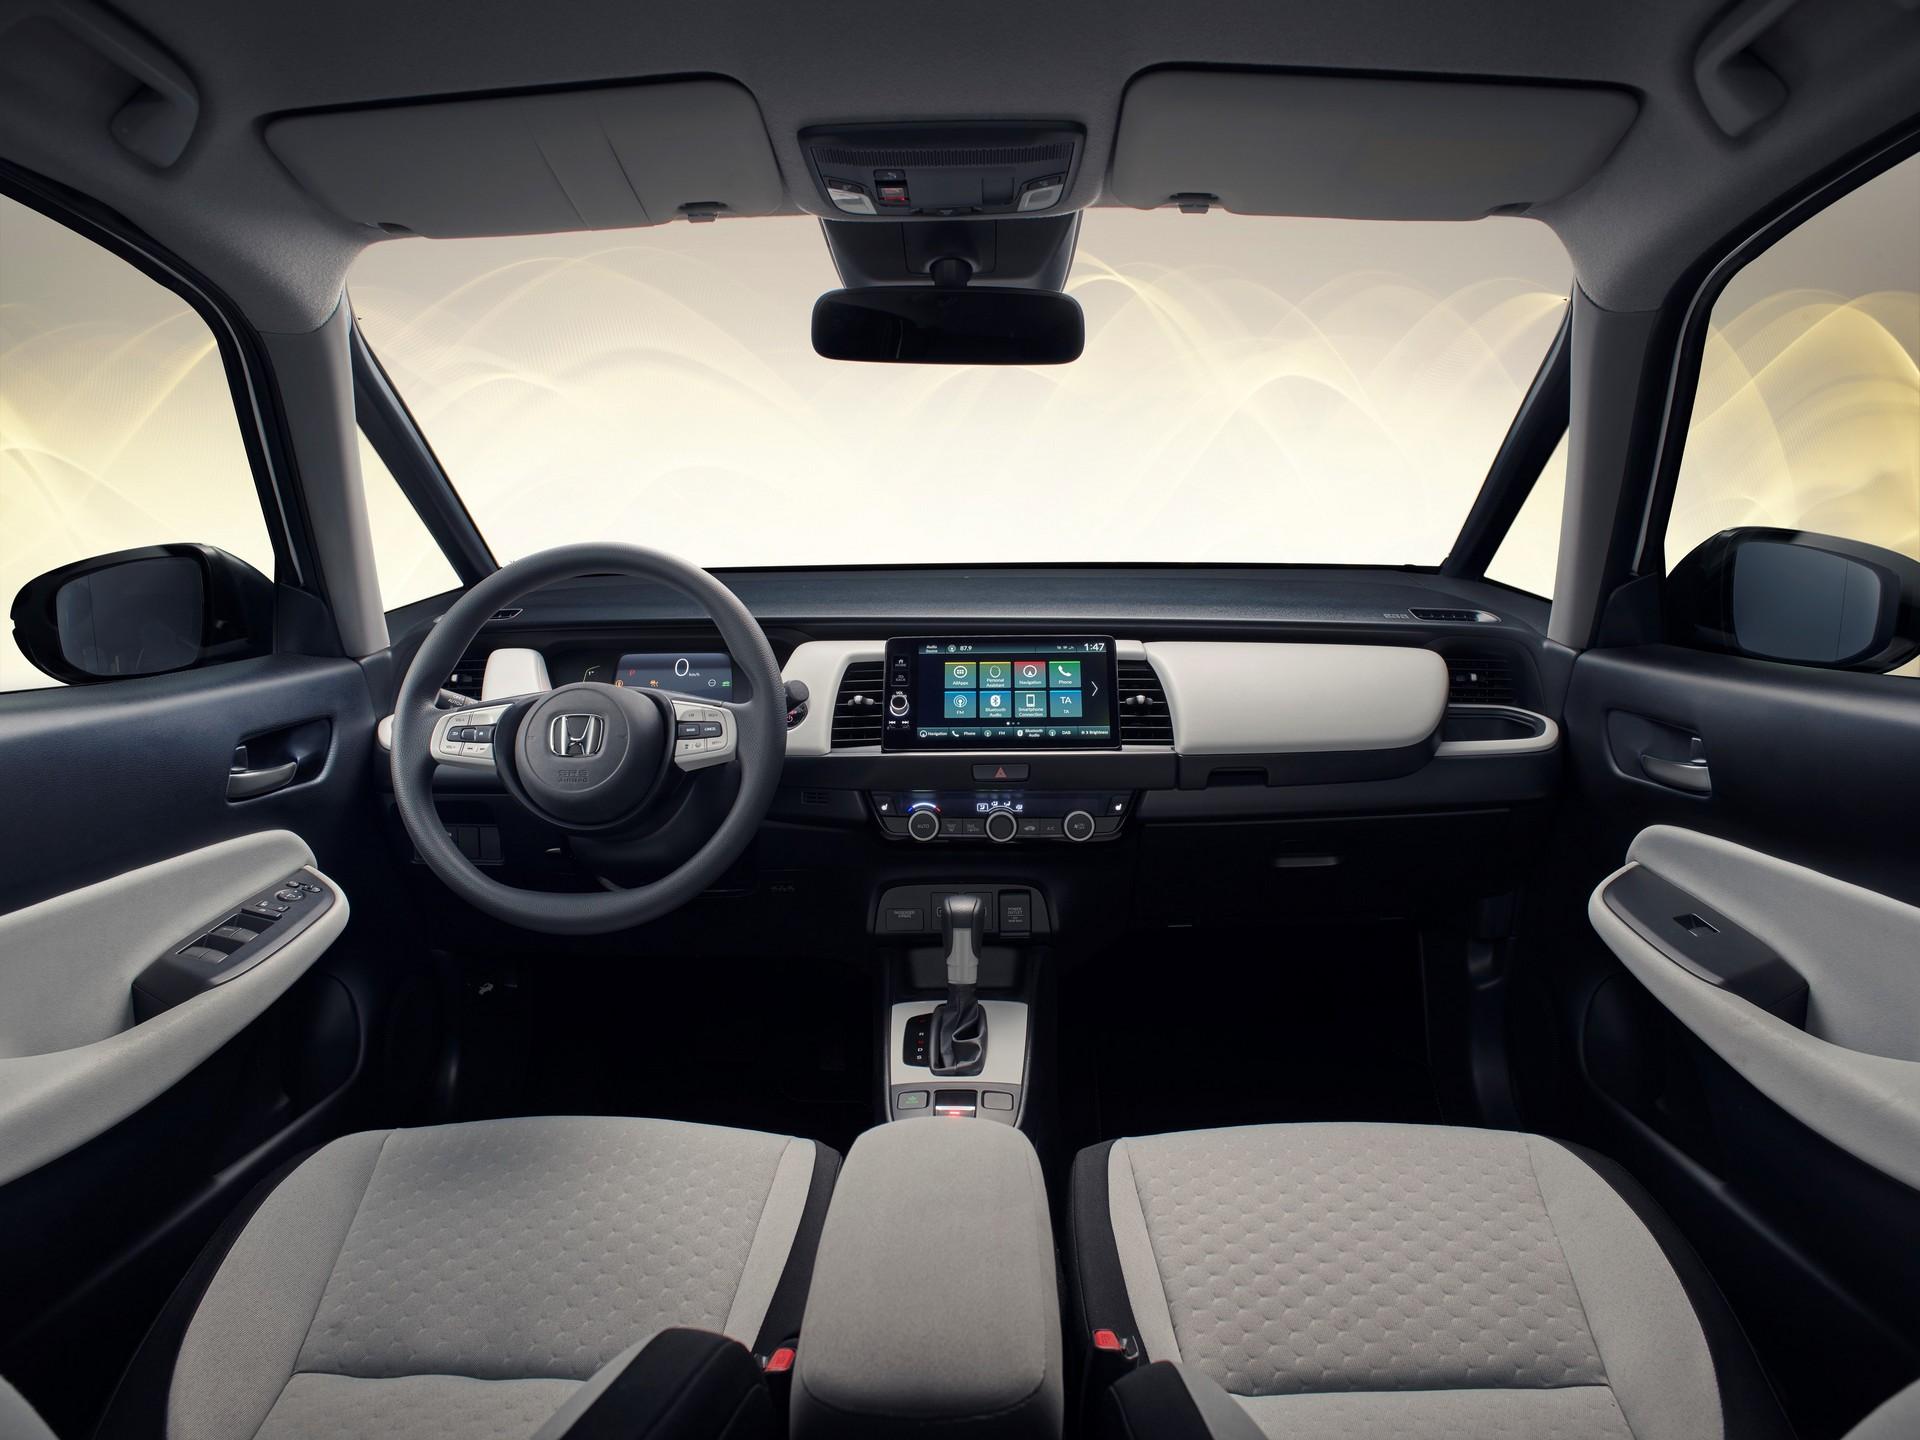 Honda Reverts to Manual Controls for 2020 Jazz